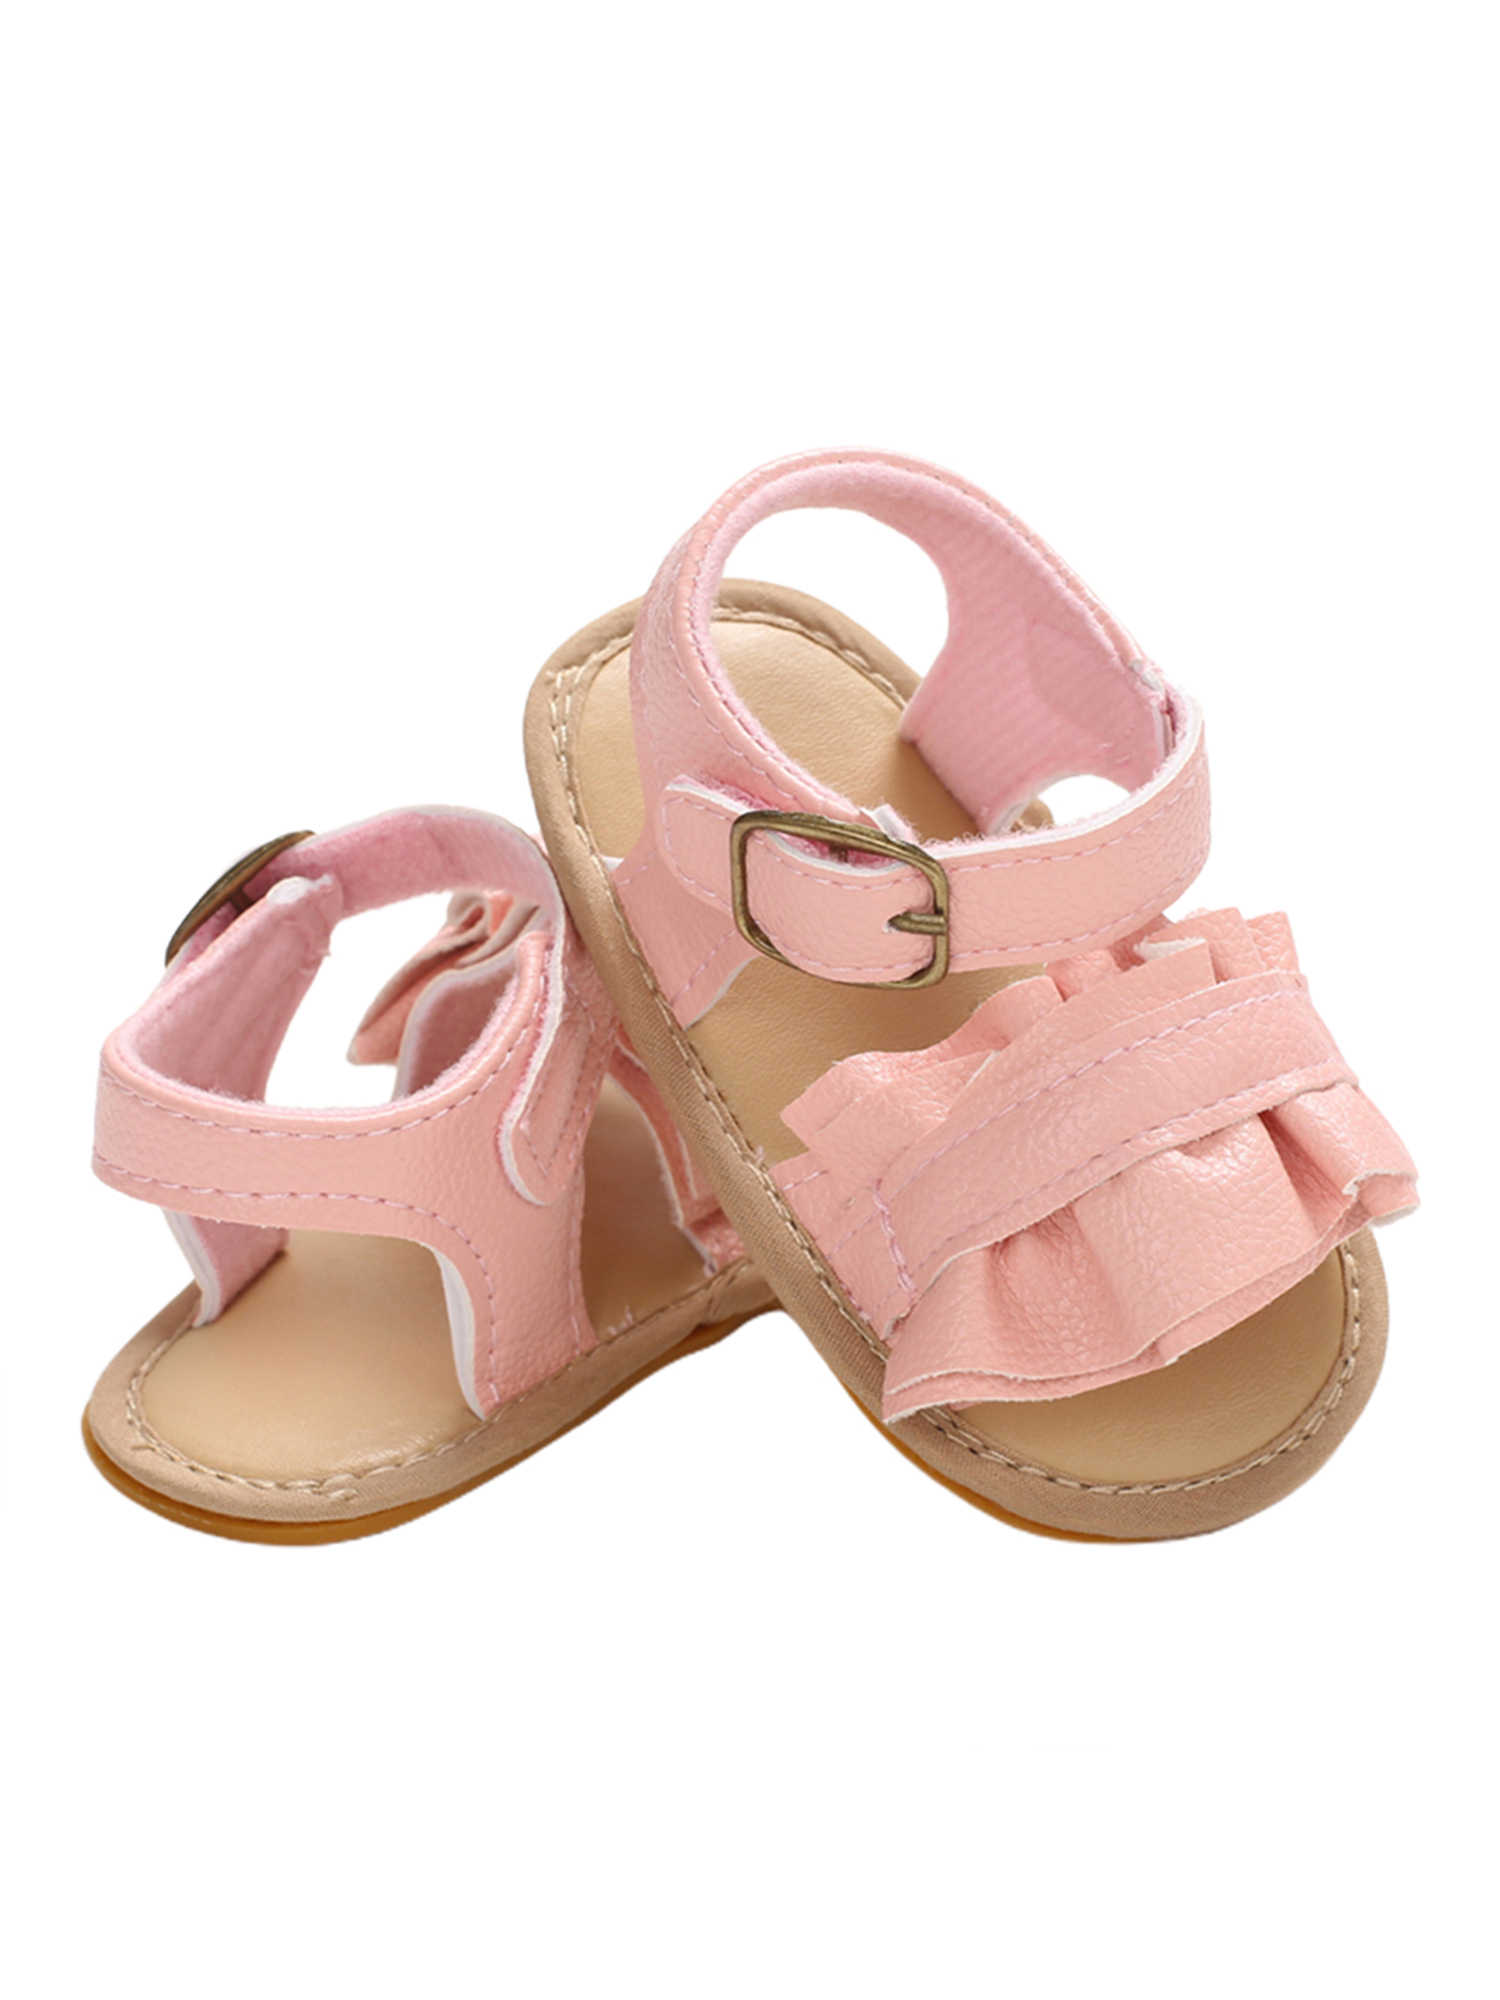 Zomer Pasgeboren Peuter Baby Meisjes Zoete Ademende Sandalen Soft Sole Antislip Schoenen Prewalker